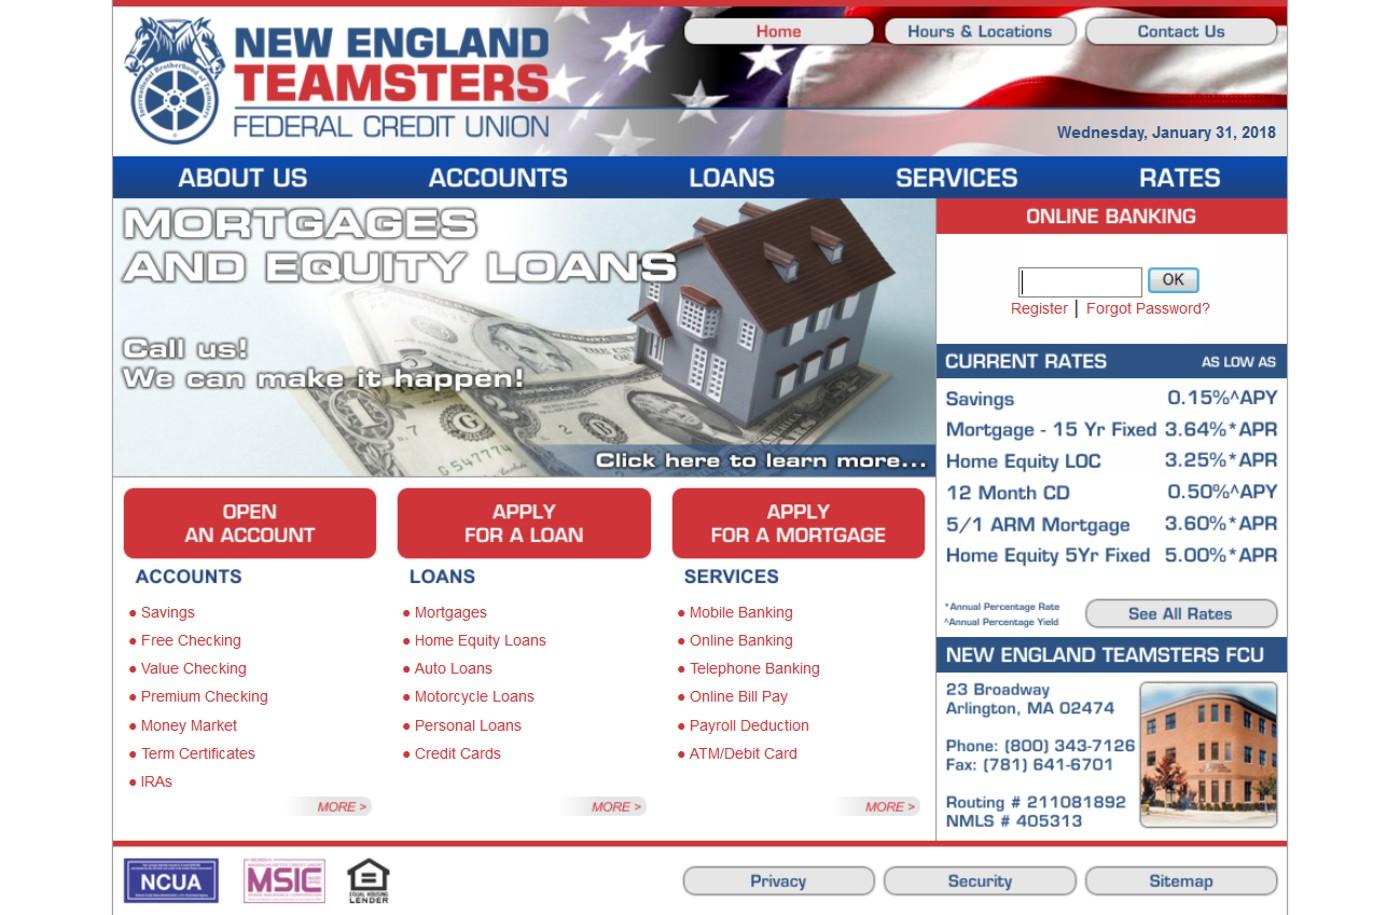 New England Teamsters FCU